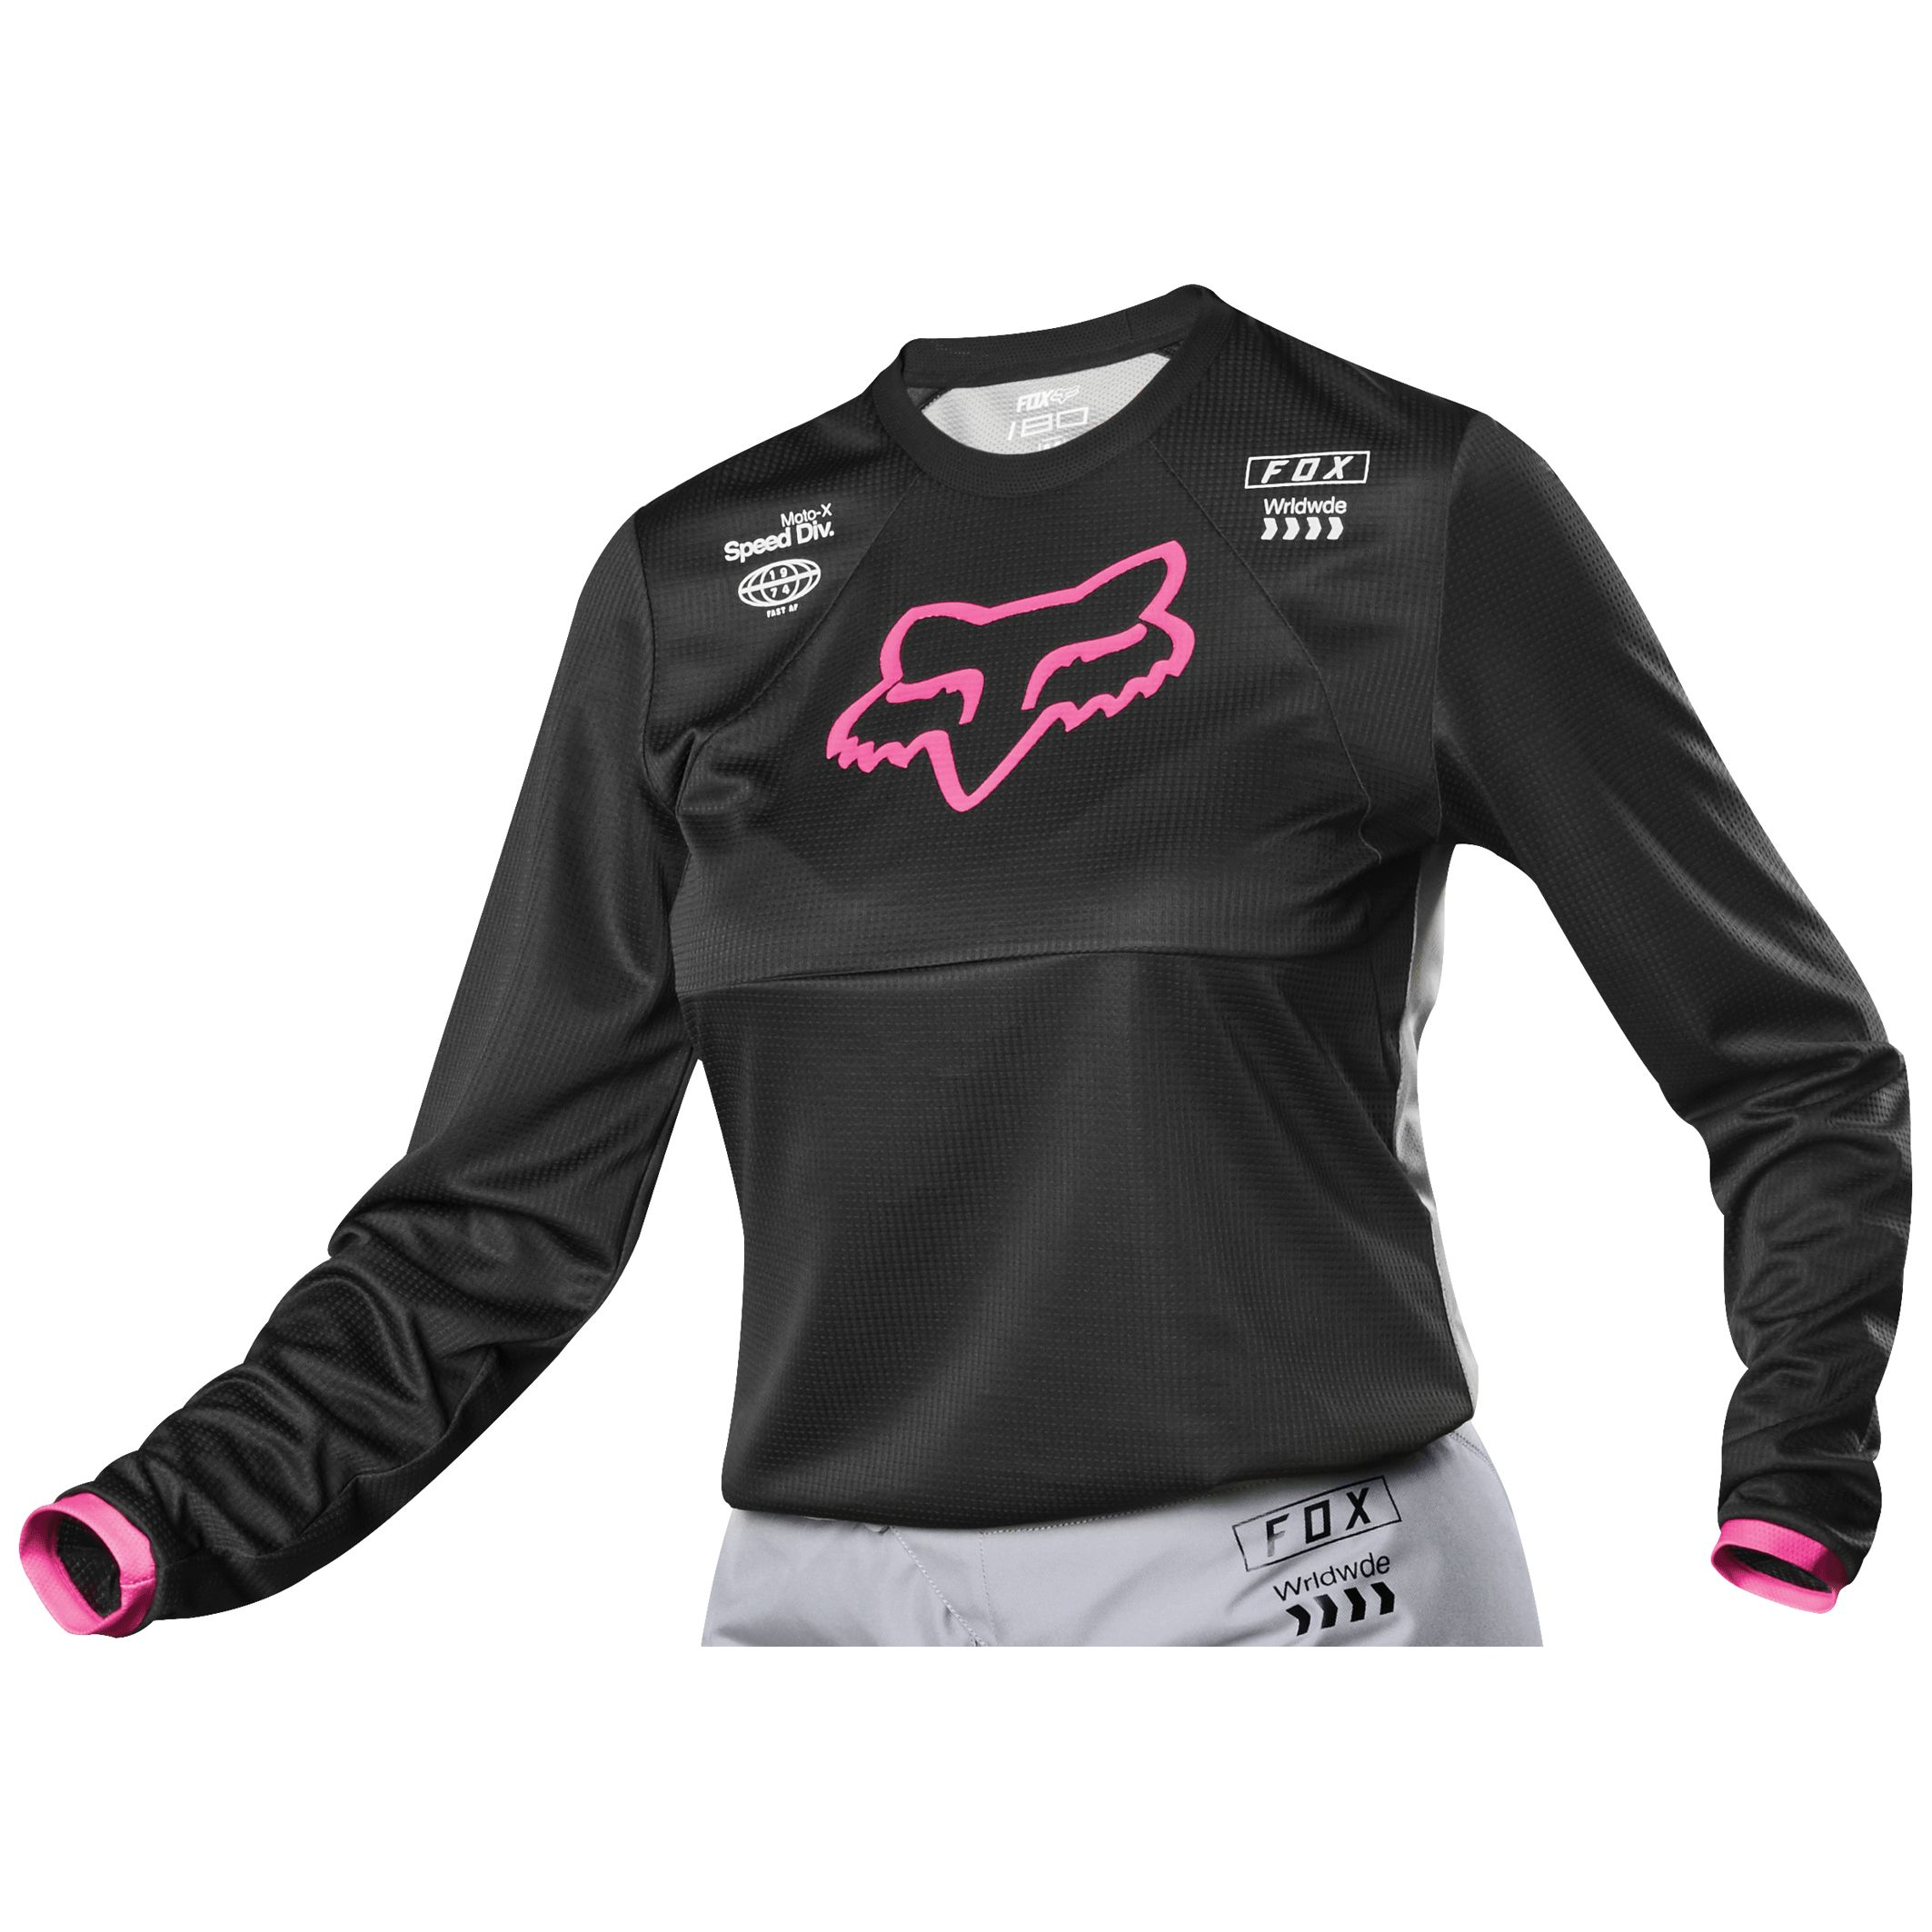 Camiseta de motocross Fox WOMEN 180 - MATA - BLACK PINK 2019 ... dd5a8a83c68